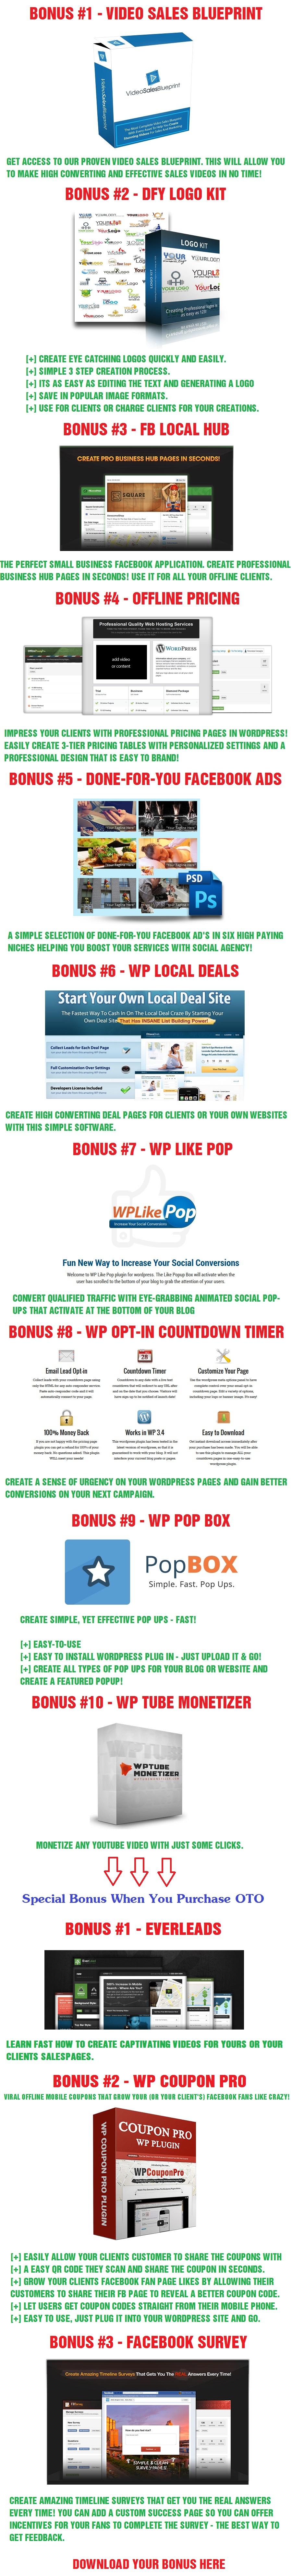 Social Agency Bonus